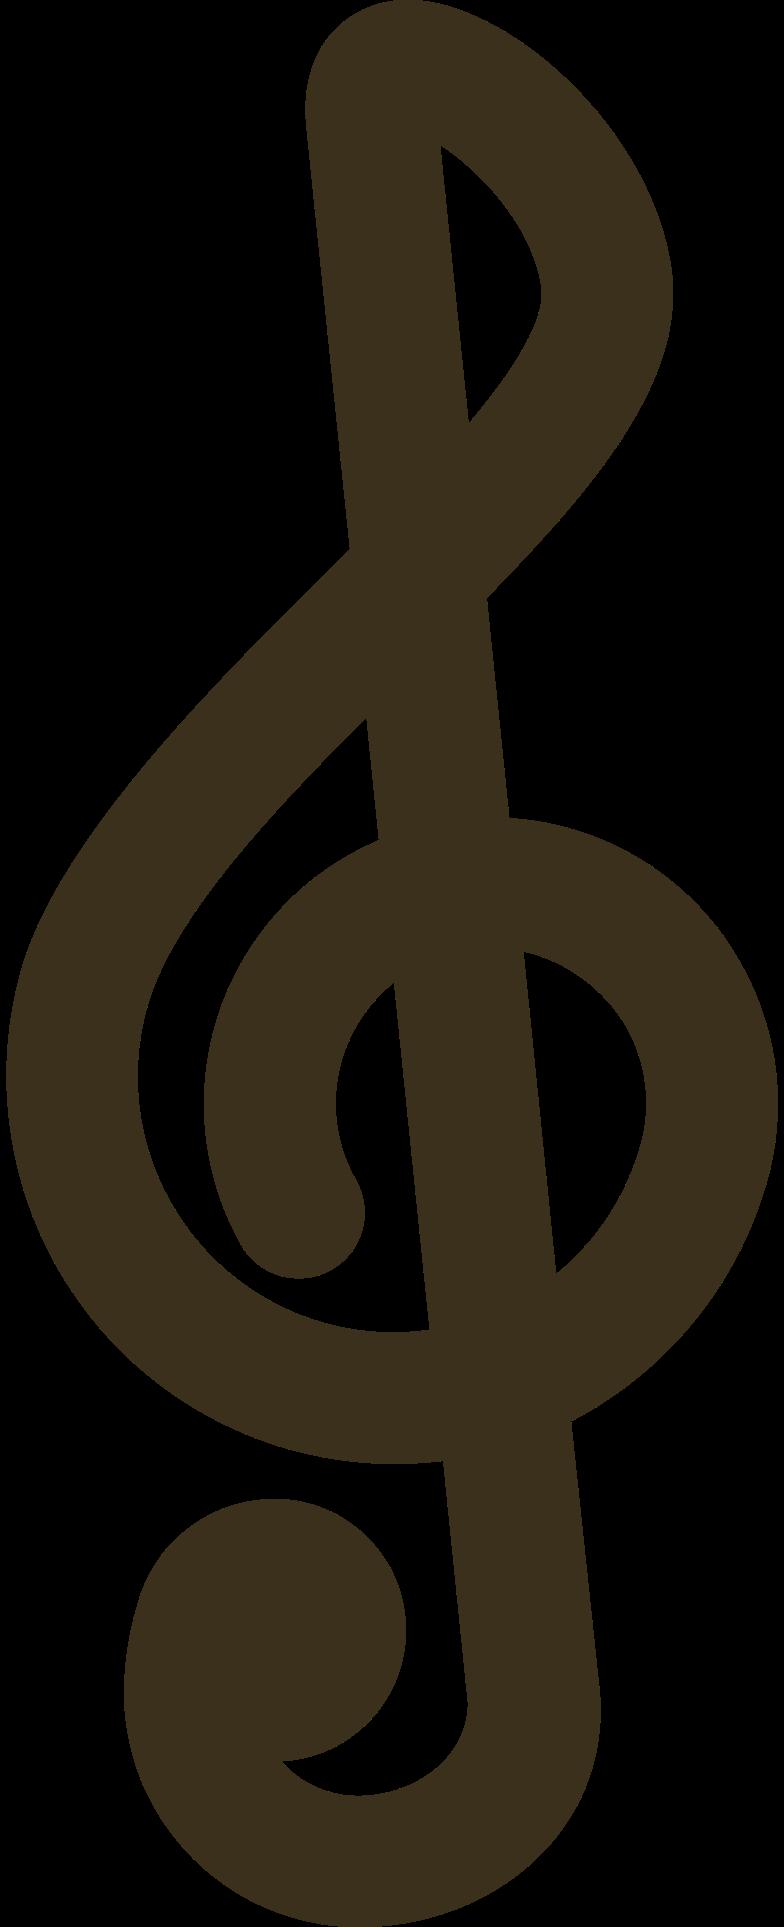 Ilustración de clipart de Nota musical clave en PNG, SVG